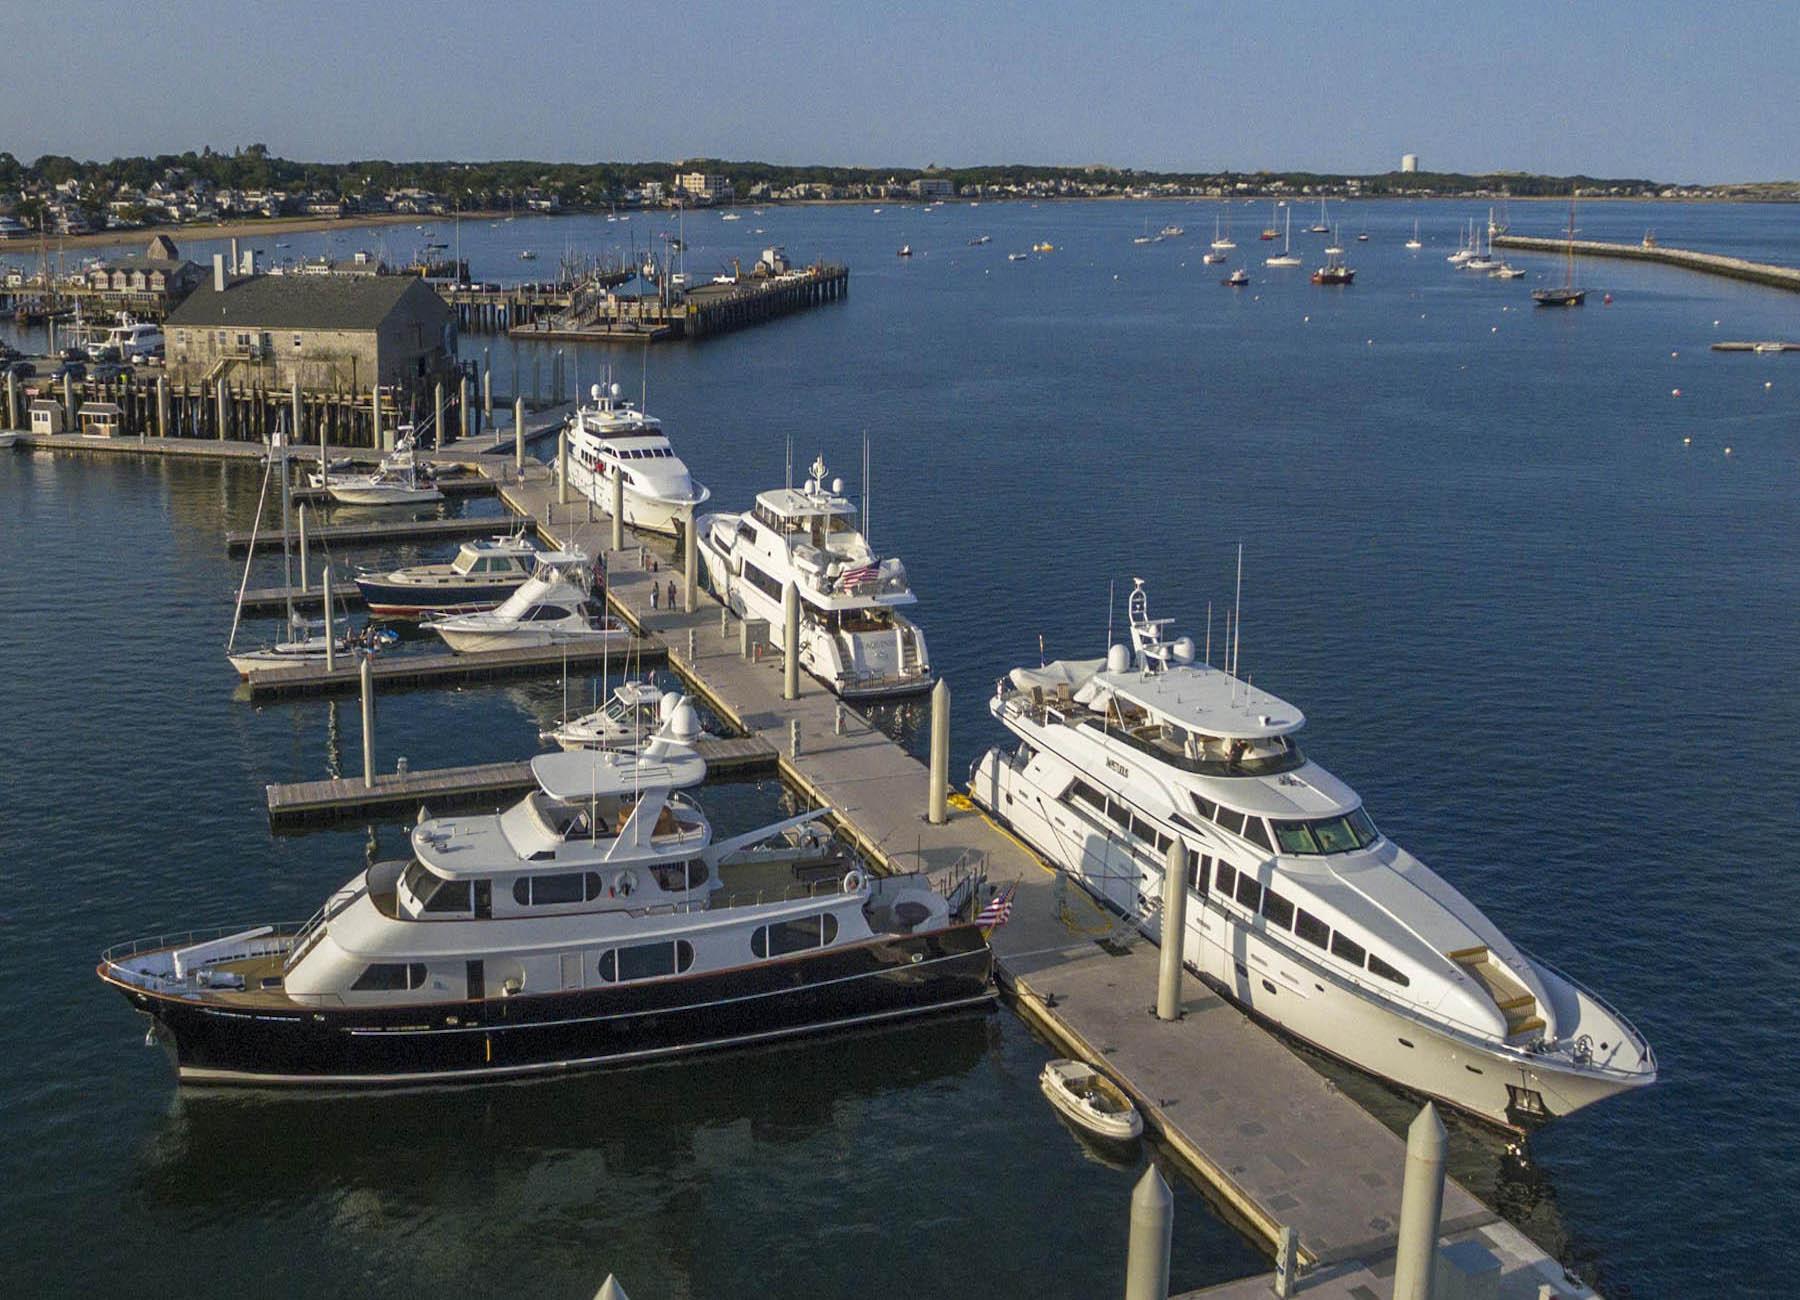 Provincetown Marina Aerial | Snag-A-Slip